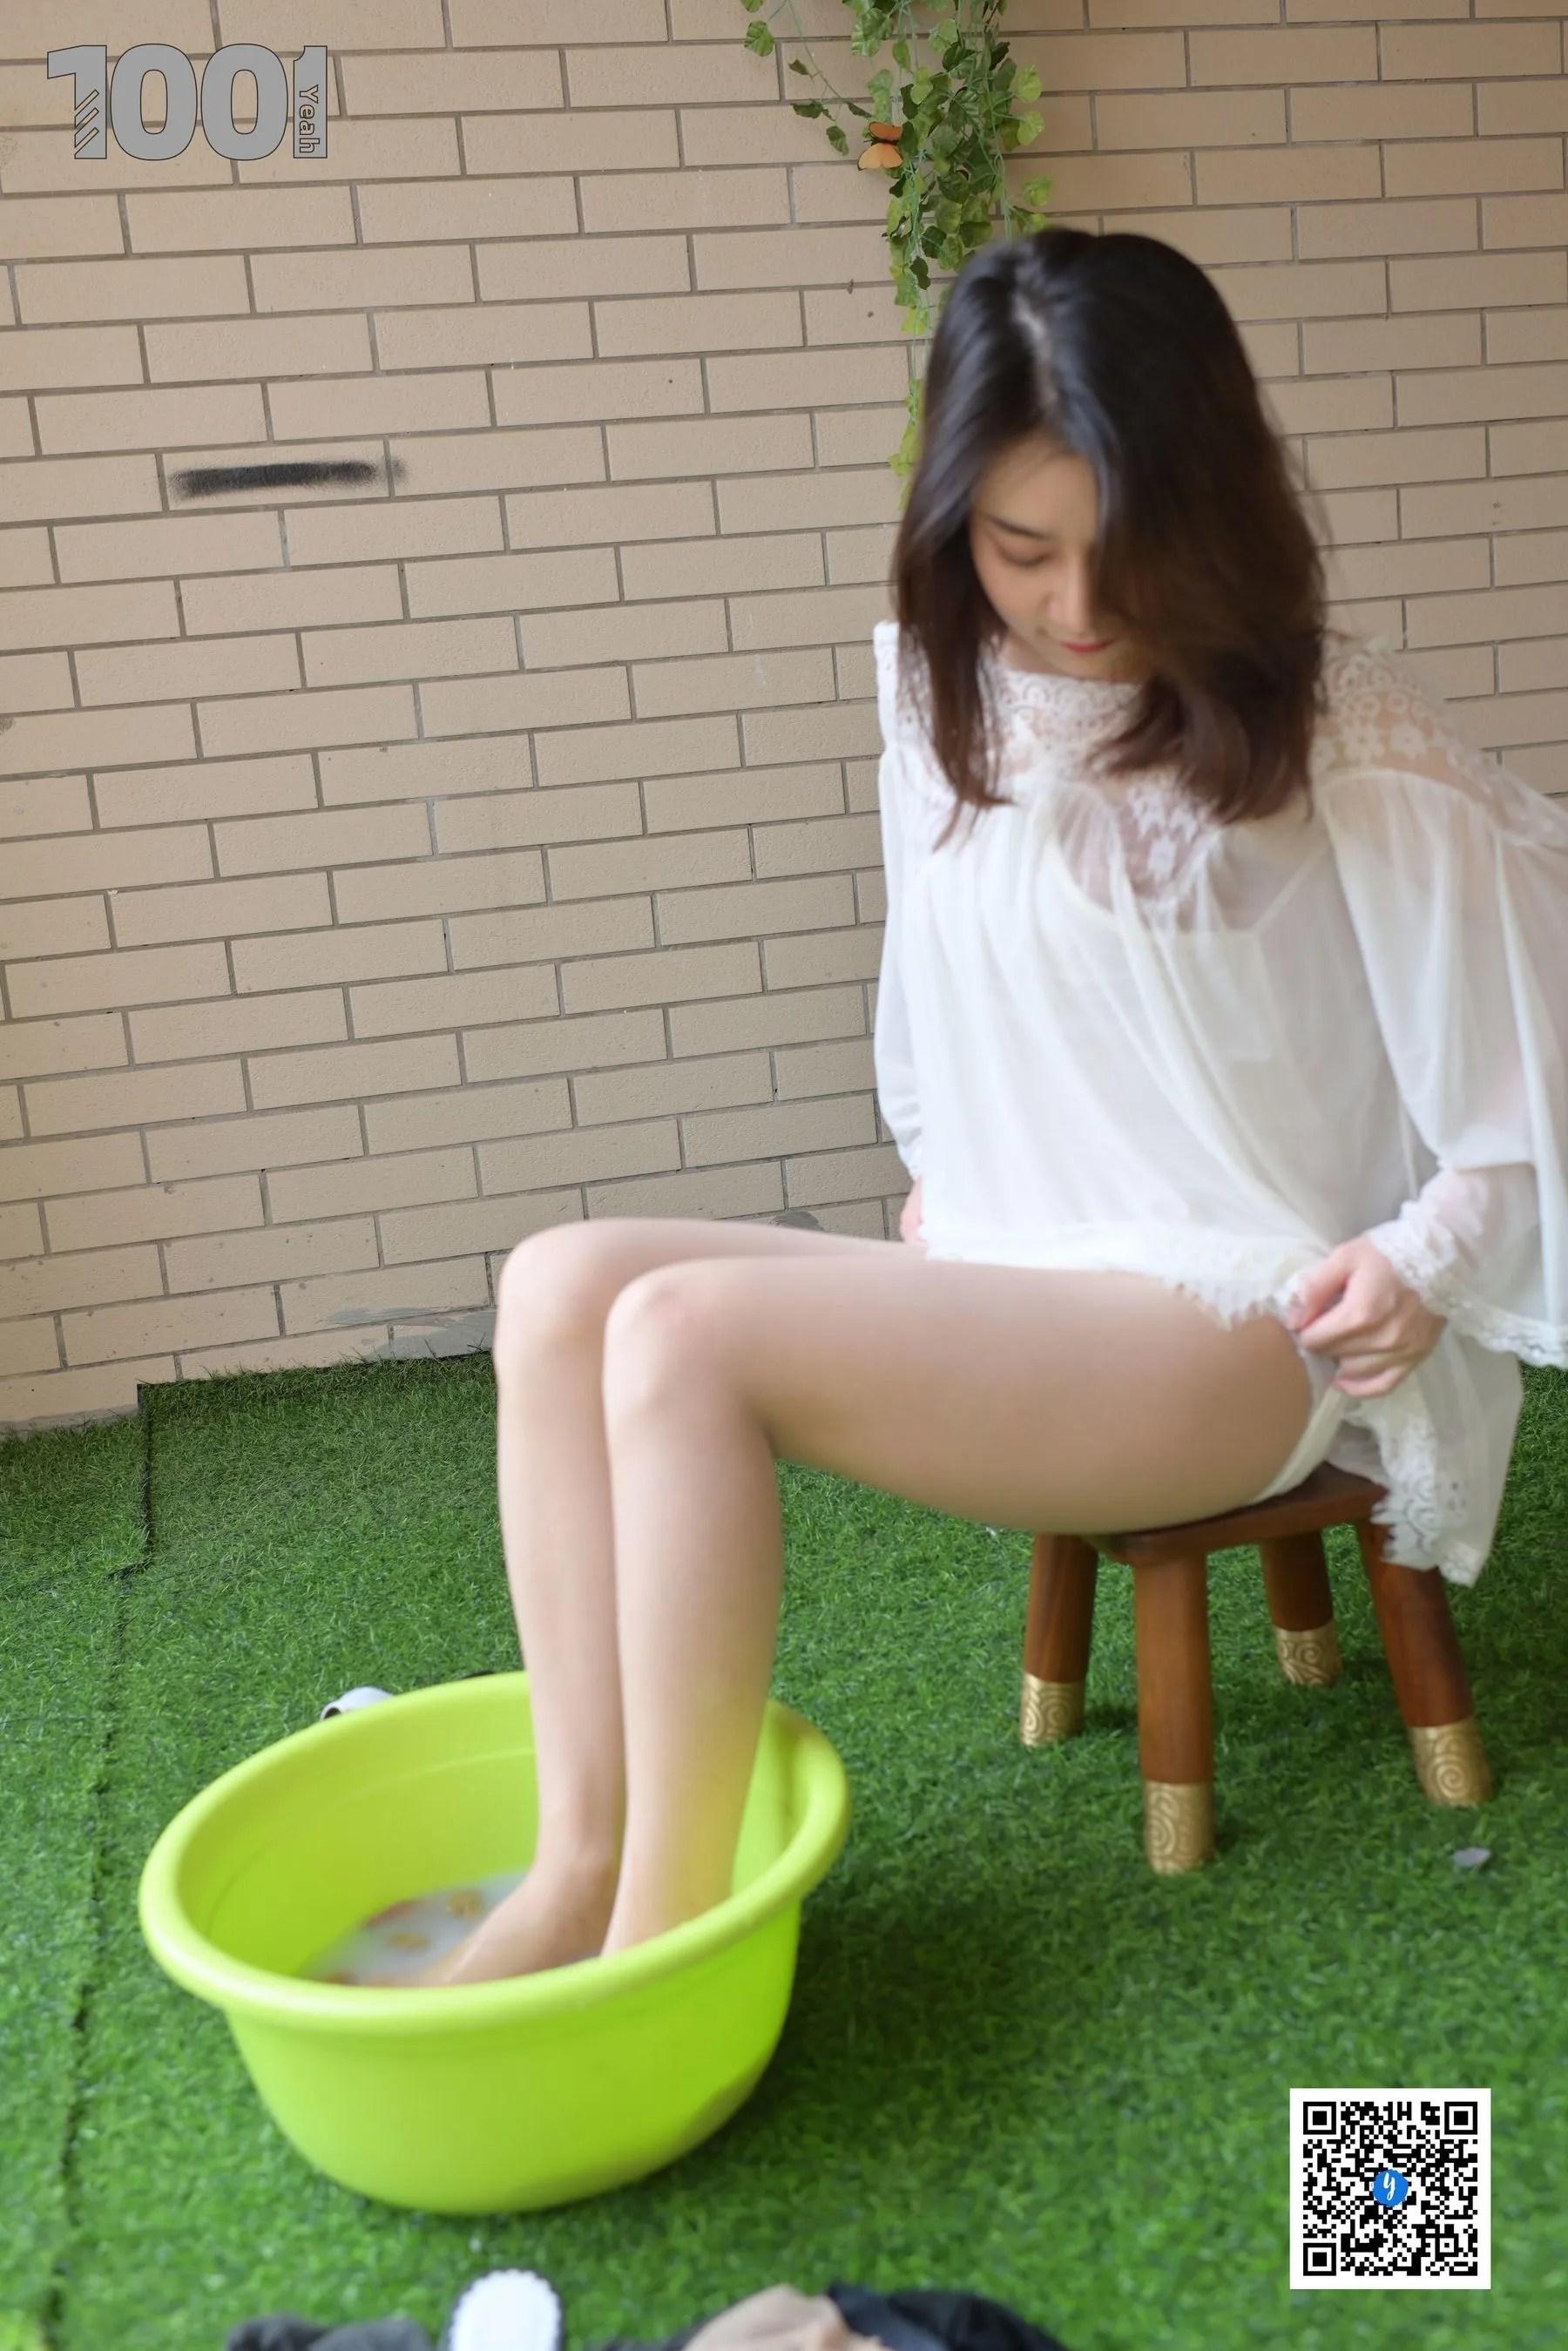 [IESS] NO.182 真真【洗丝5】  丝袜美腿写真[60P]插图(10)